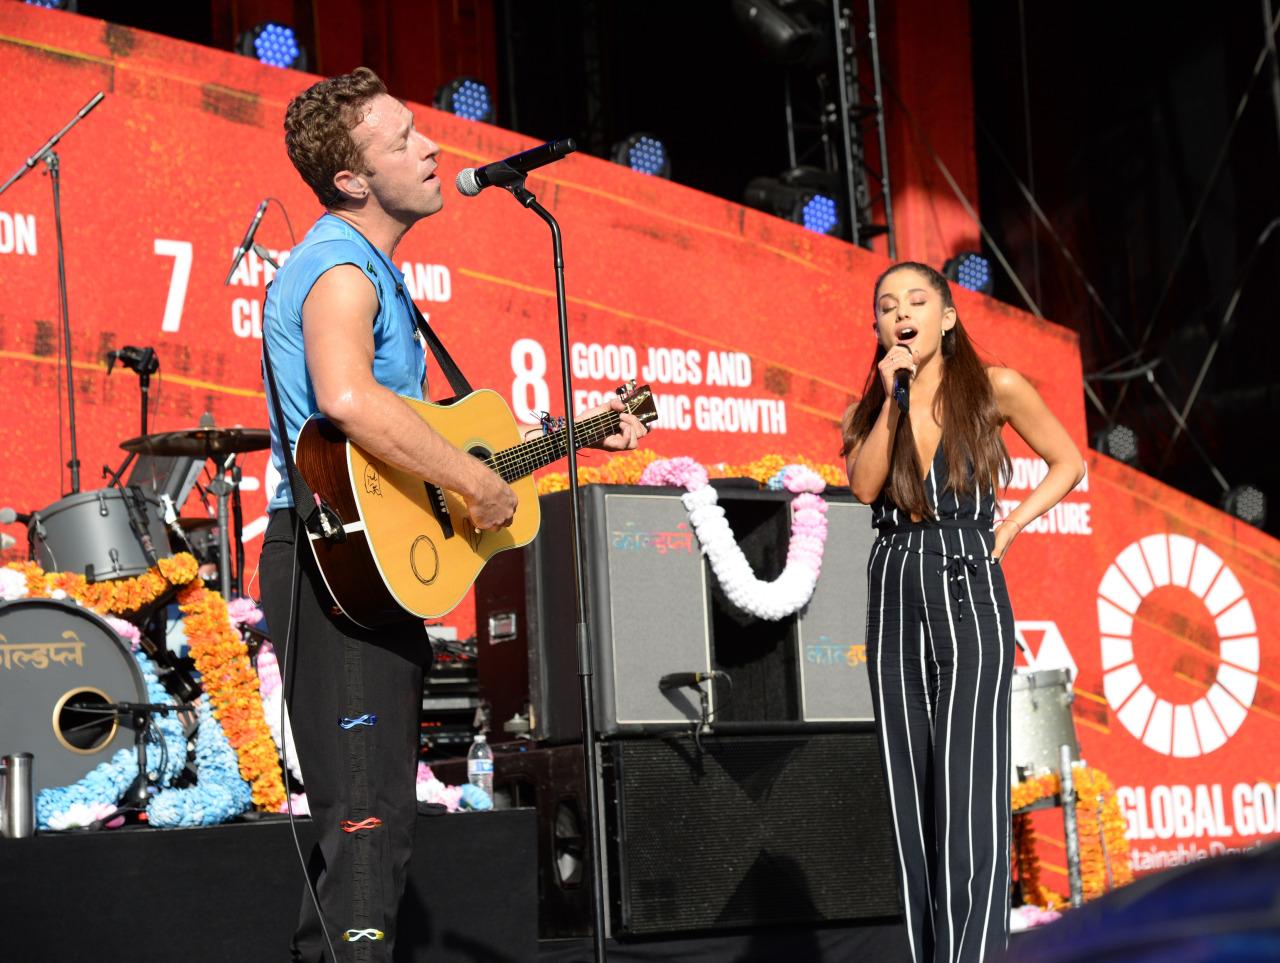 Ariana Grande x Coldplay - Global Citizens Festival 2015